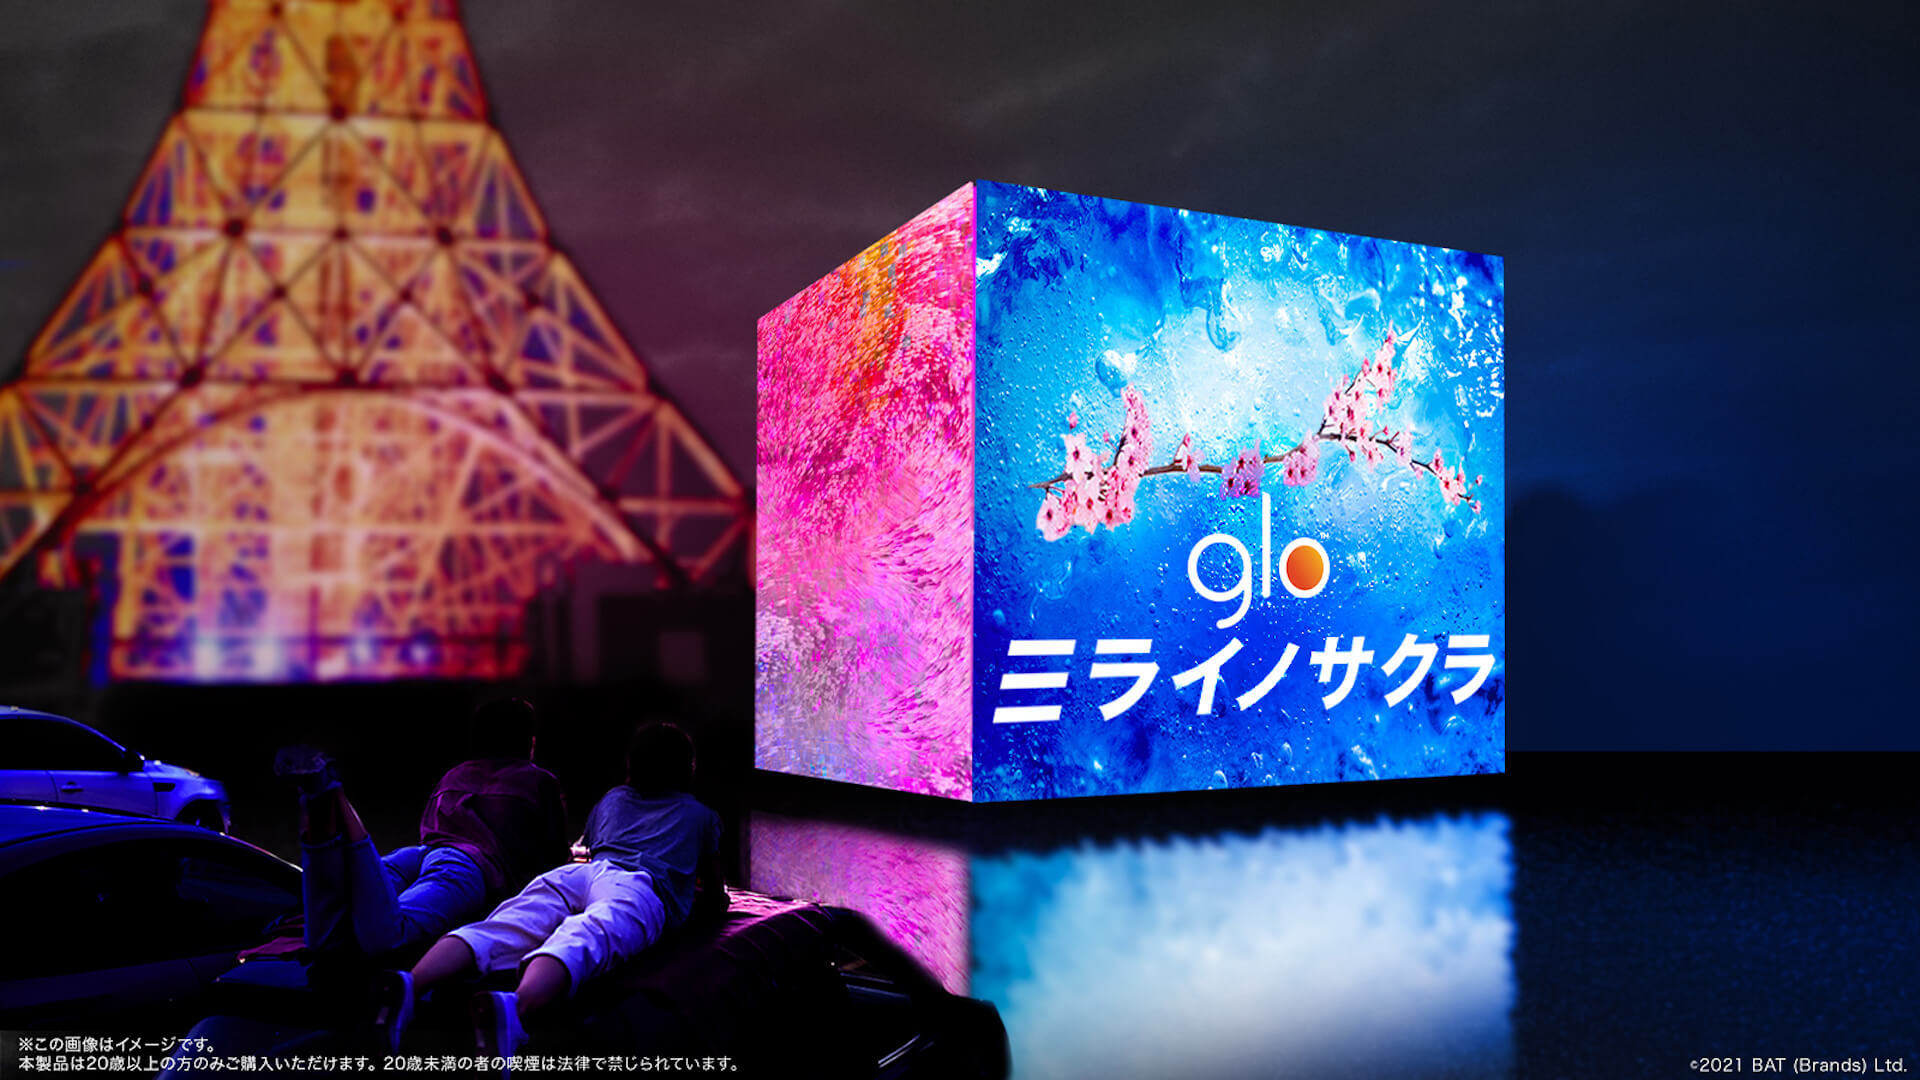 gloとblock.fmによるIGライブ「#ミライノサクラ」が開催決定!SKY-HI、☆Taku Takahashi、tofubeatsらが桜色のステージでライブ music210406_glo-blockfm-210406_7